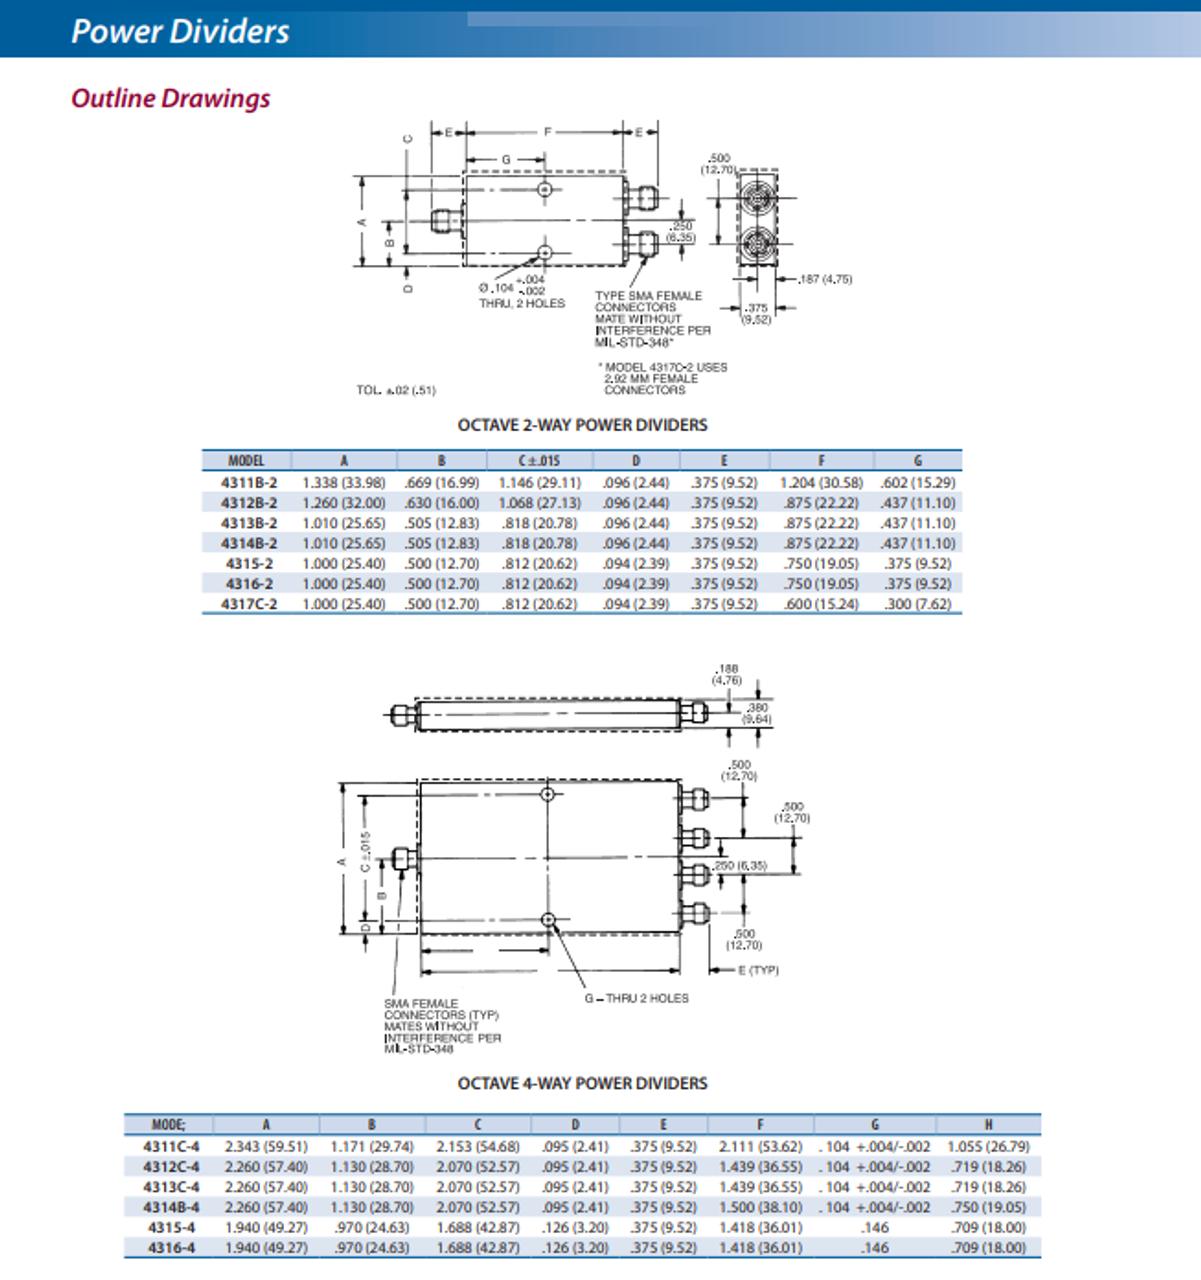 Narda Microwave 4311B-2 - 2-Way Power Divider